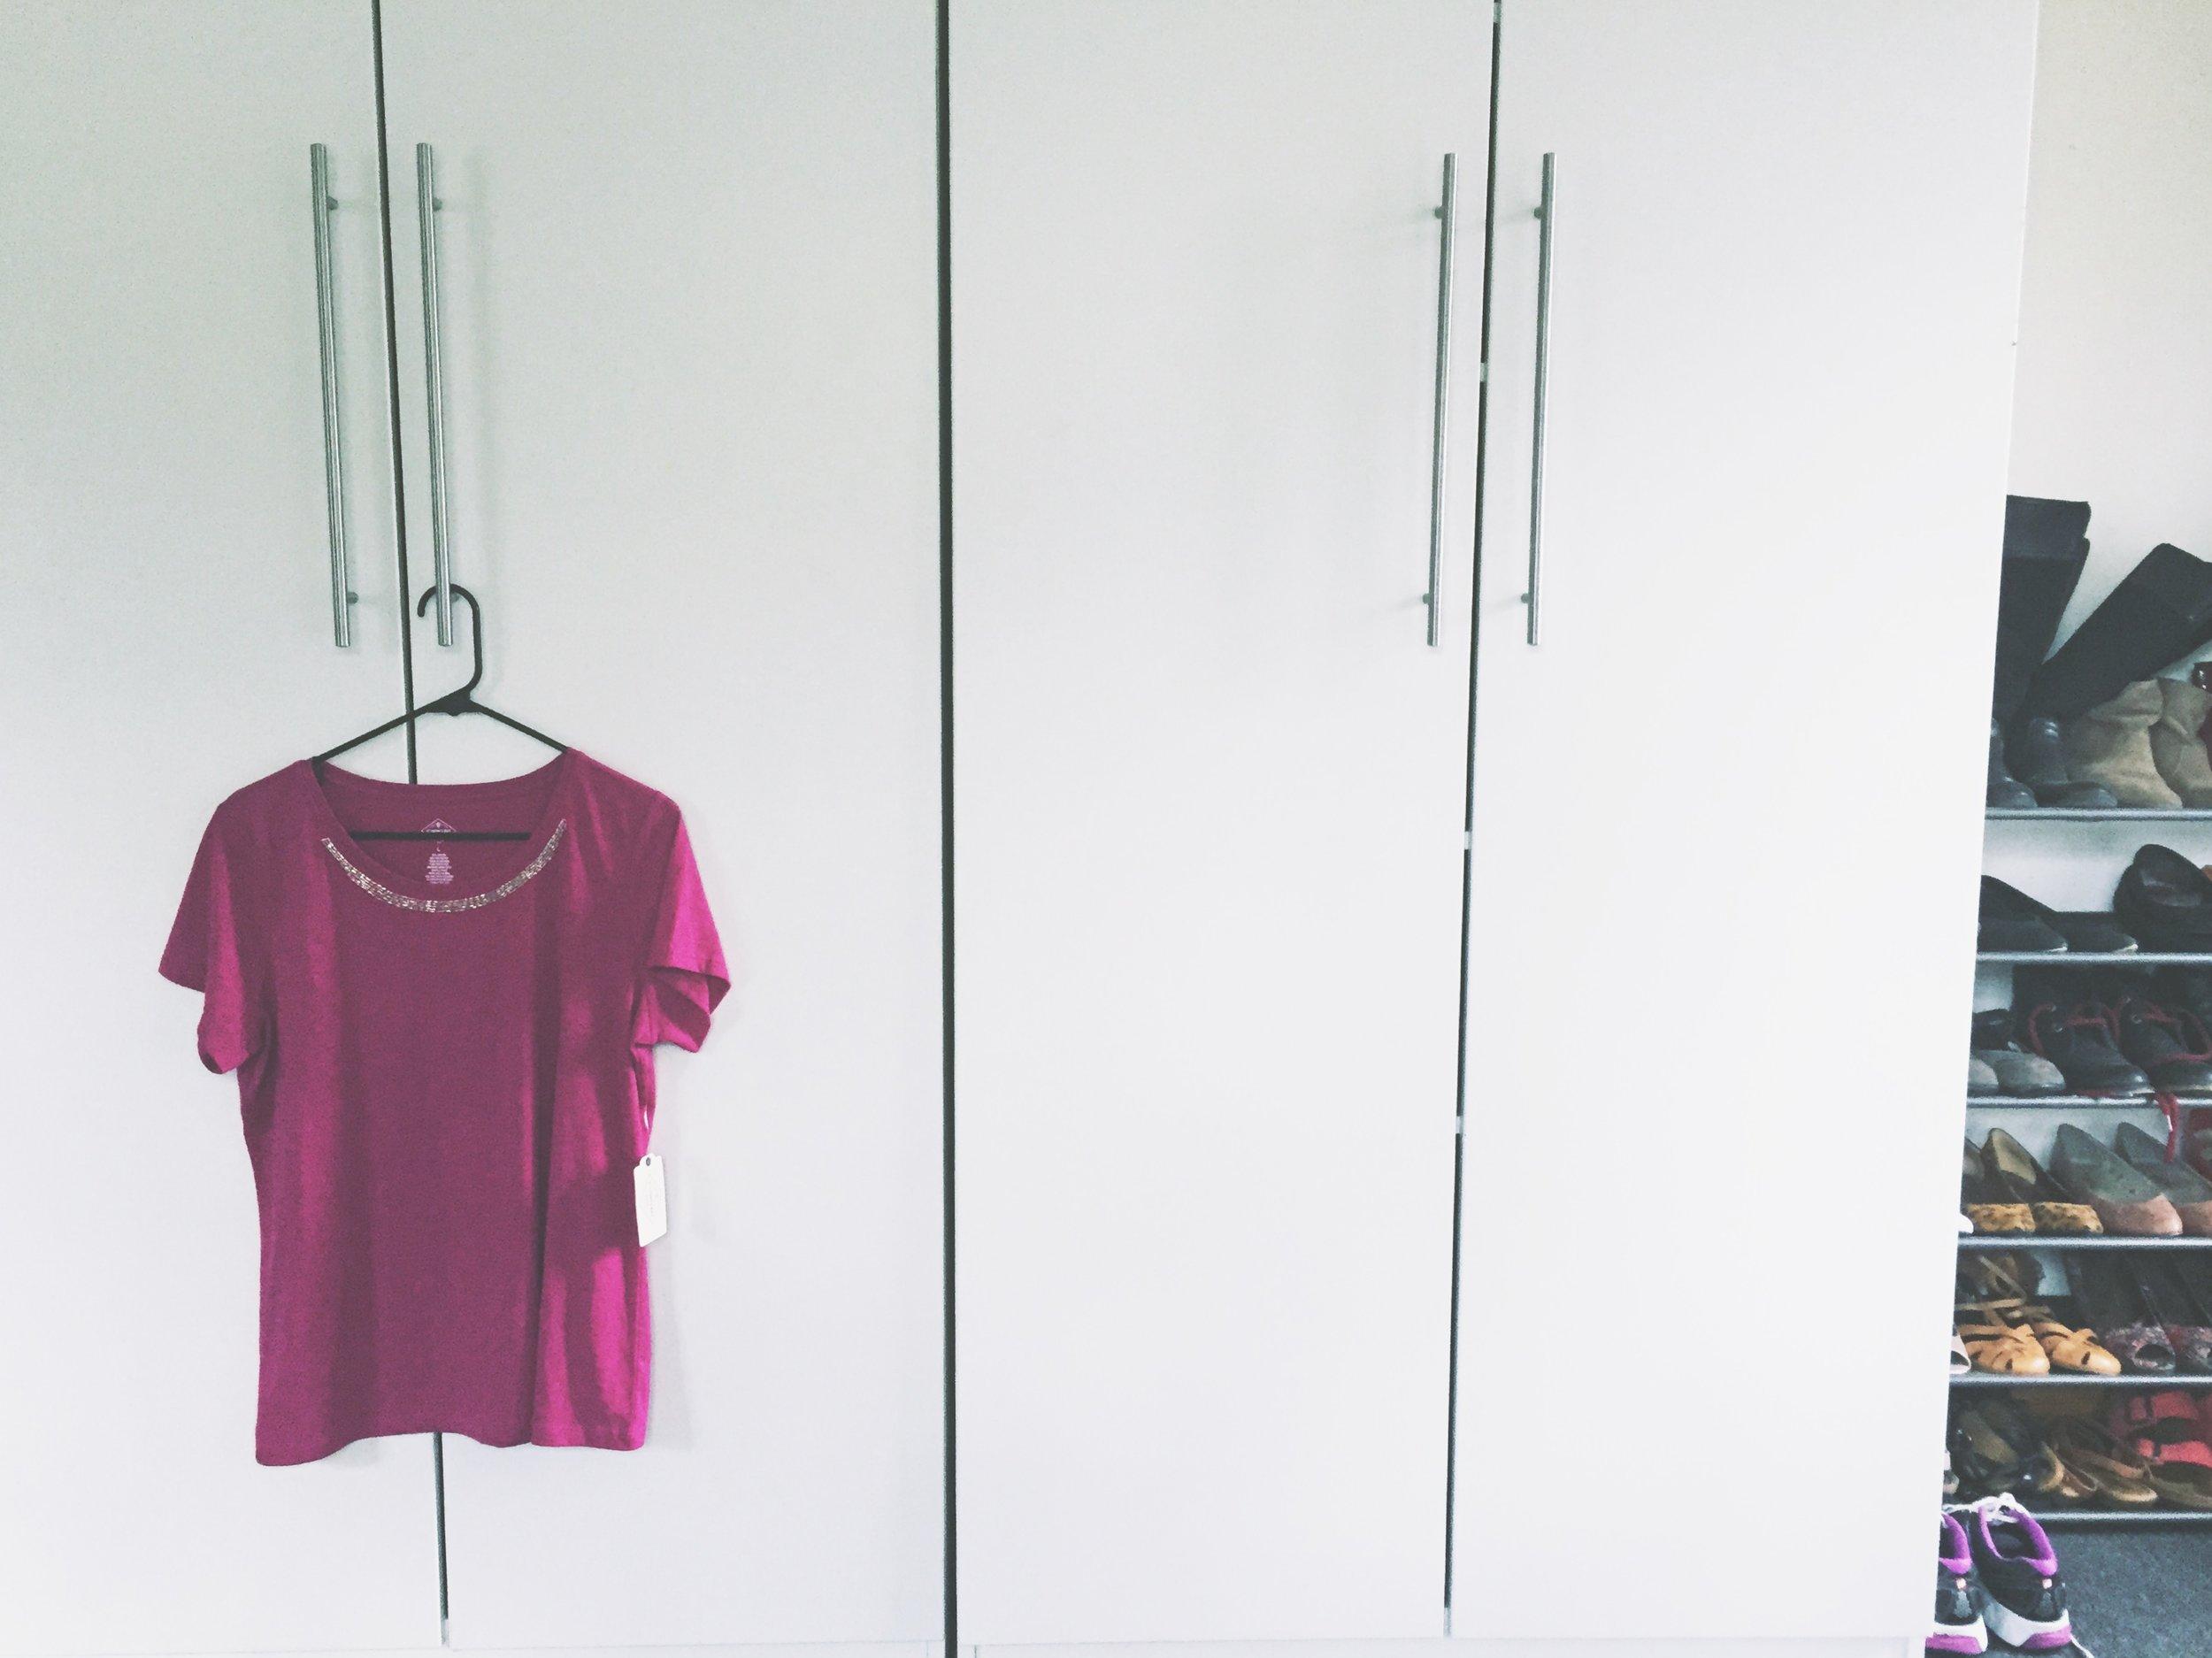 Creating a Capsule Wardrobe {Fall 2015}